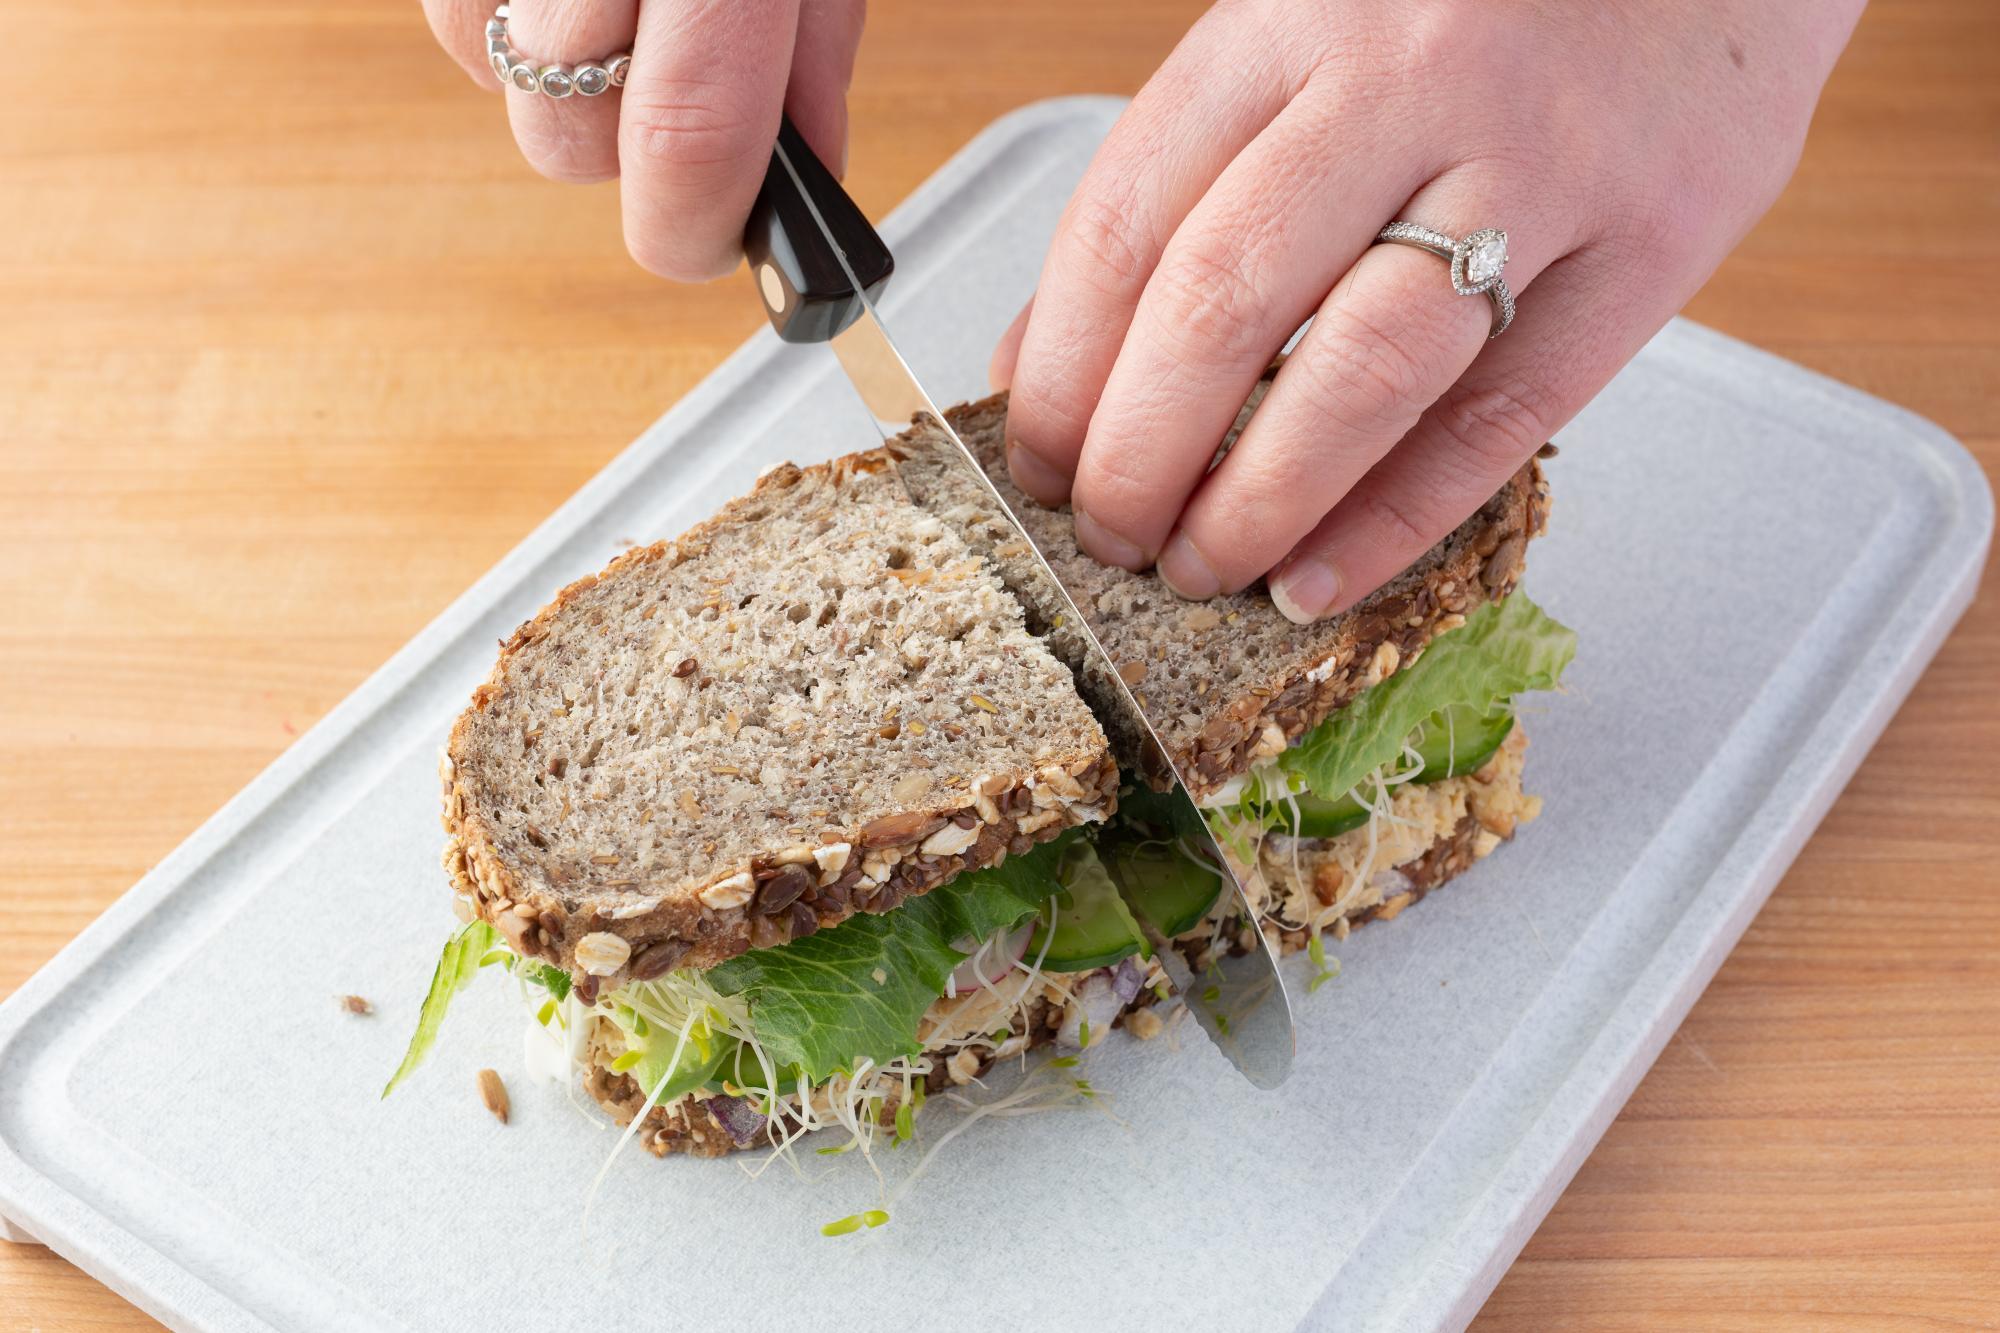 Cutting the sandwich in half with a Spatula Spreader.